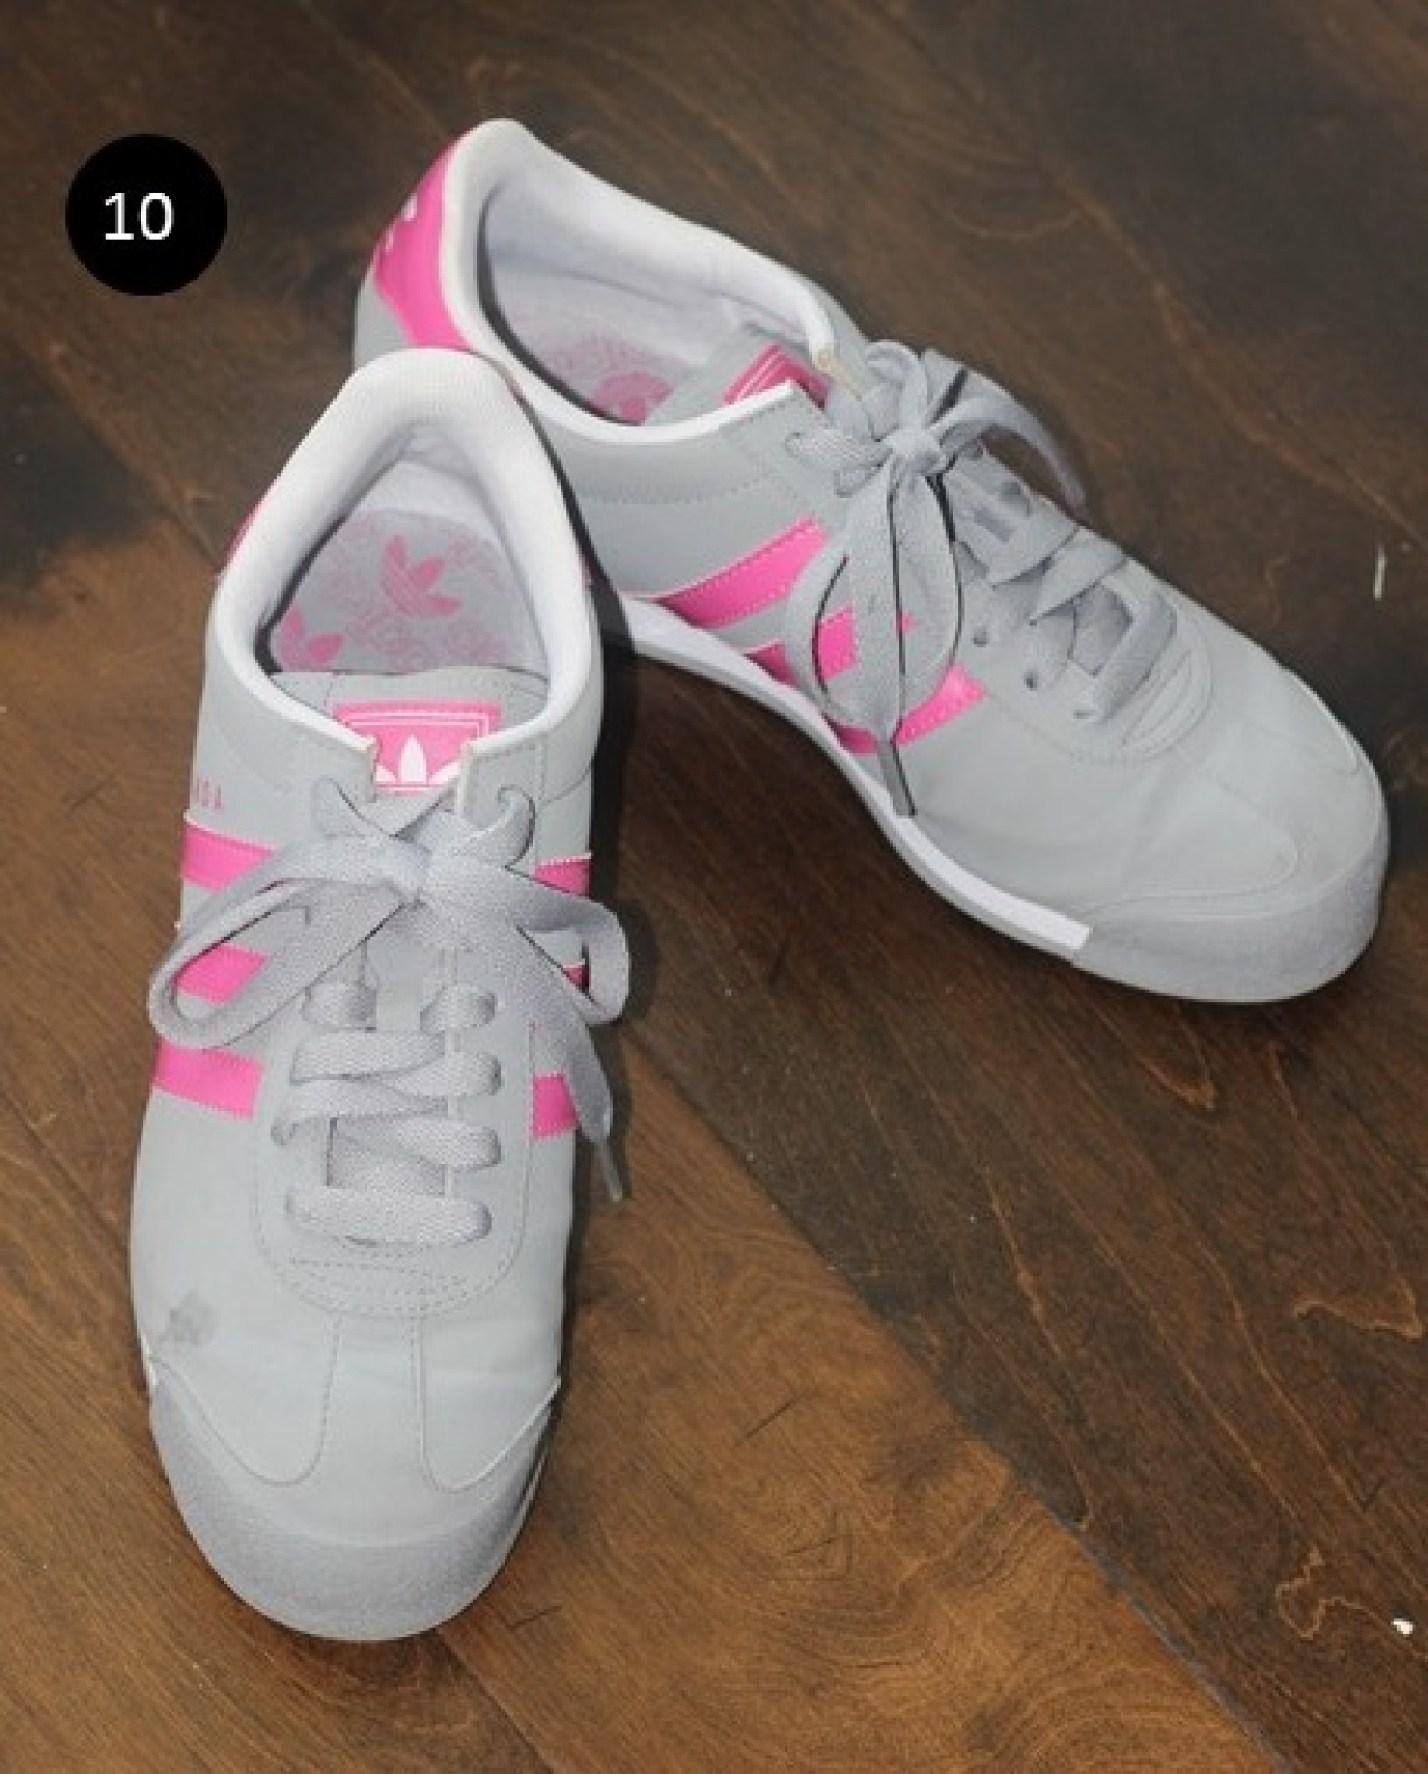 retro-pink-adidas